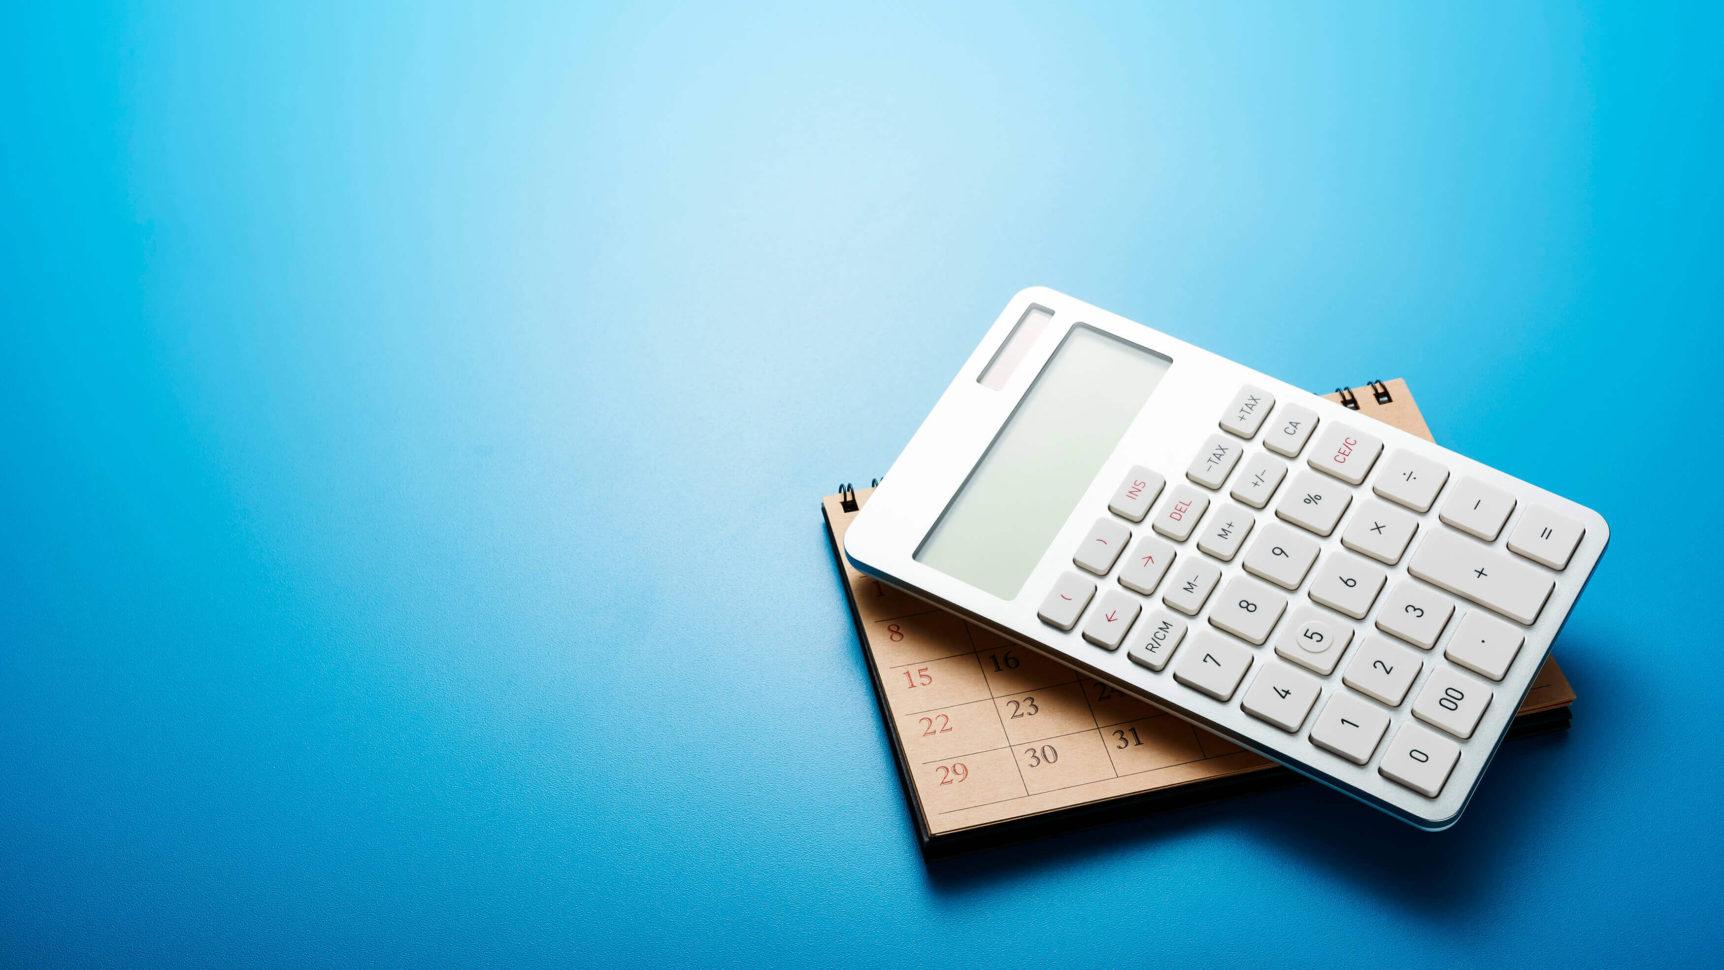 Modifiedtz Excel Spreadsheet Spreadshee Modifiedtz Excel Spreadsheet